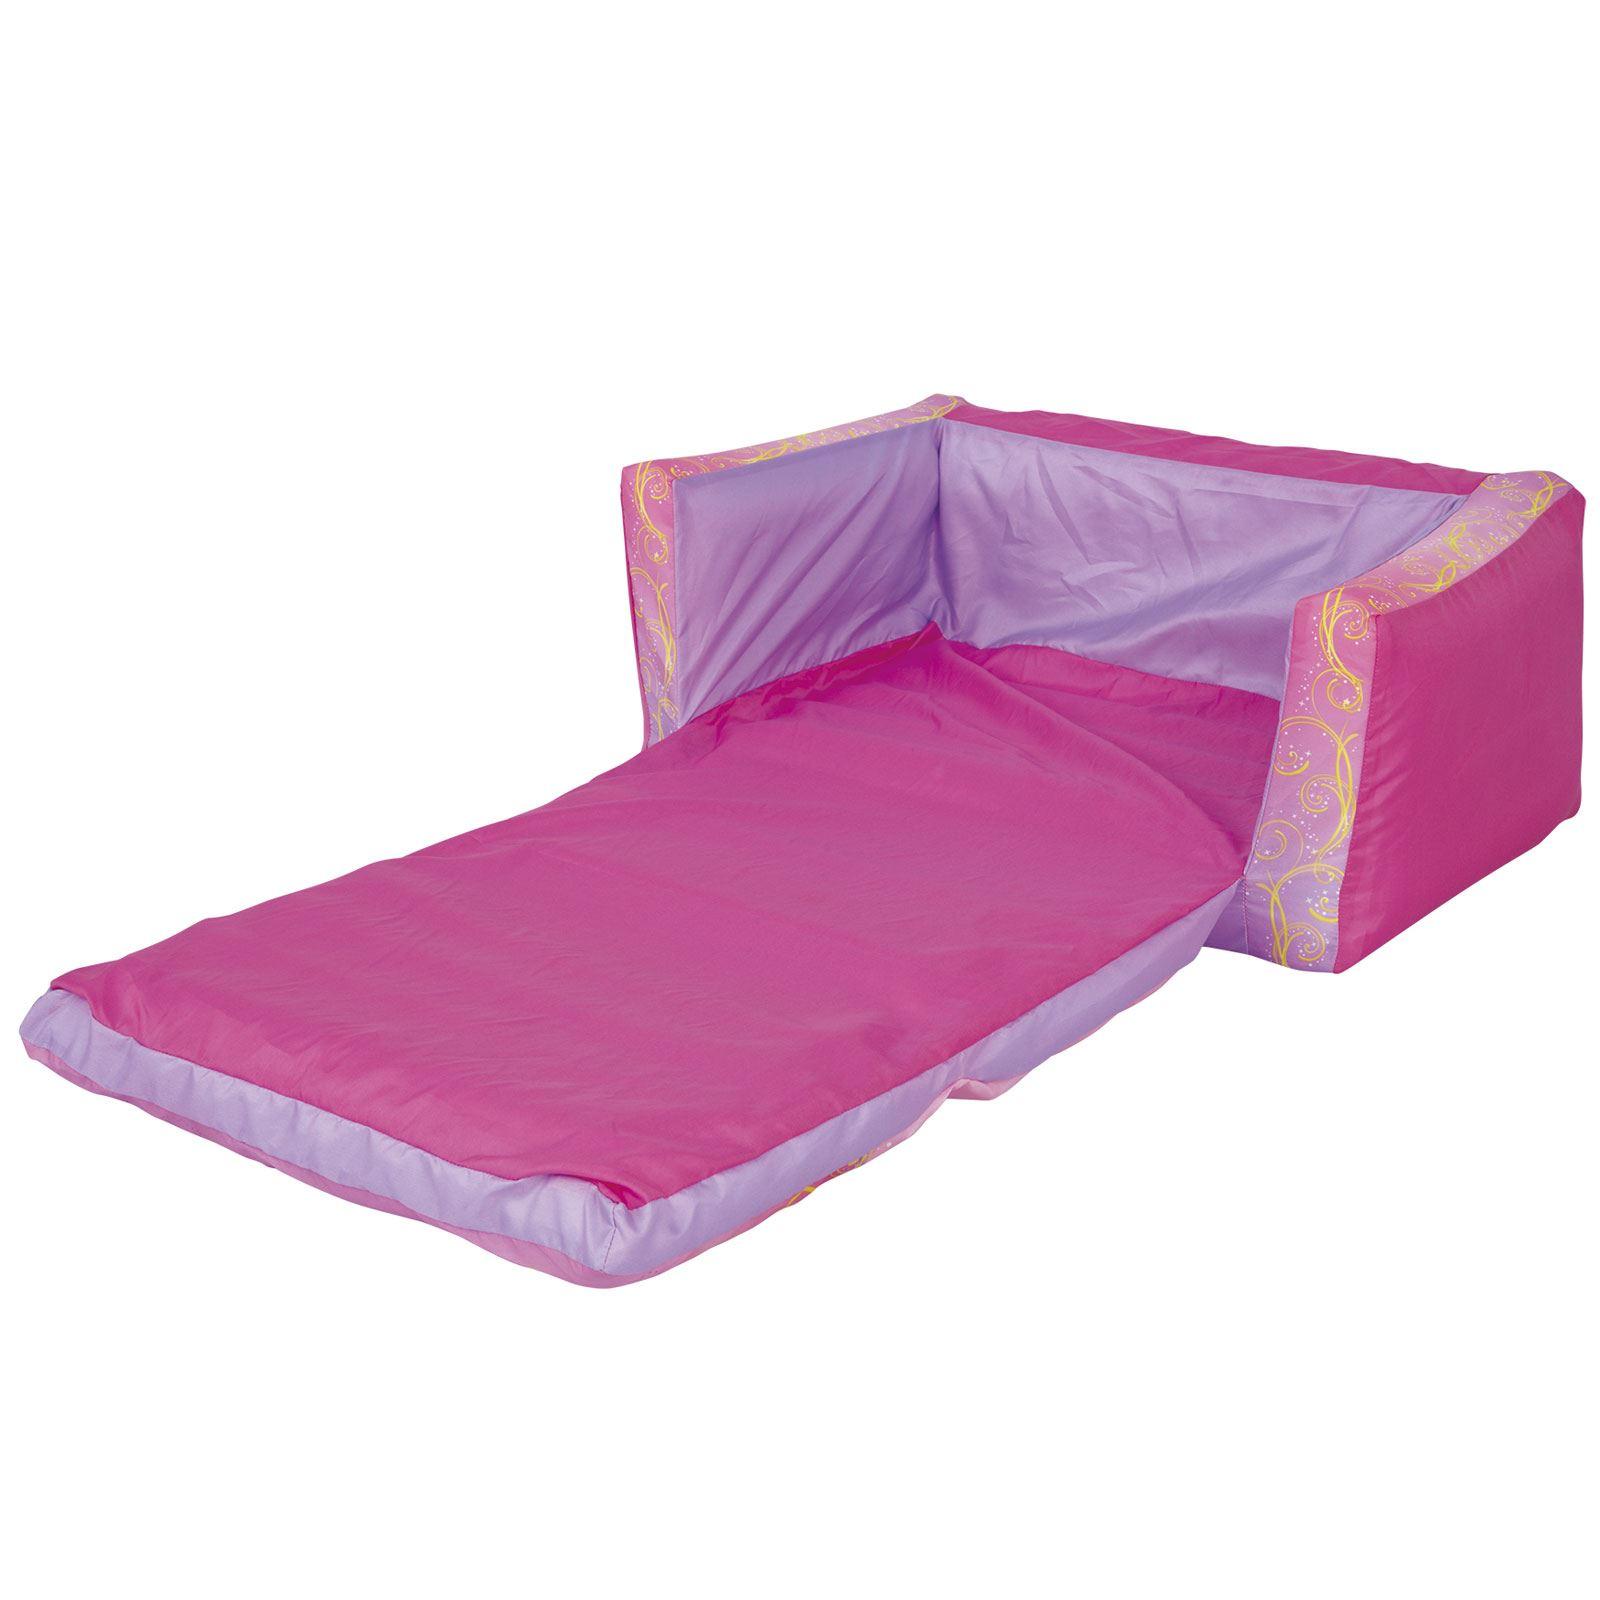 disney cars flip out sofa australia rp reviews range inflatable kids room new minions